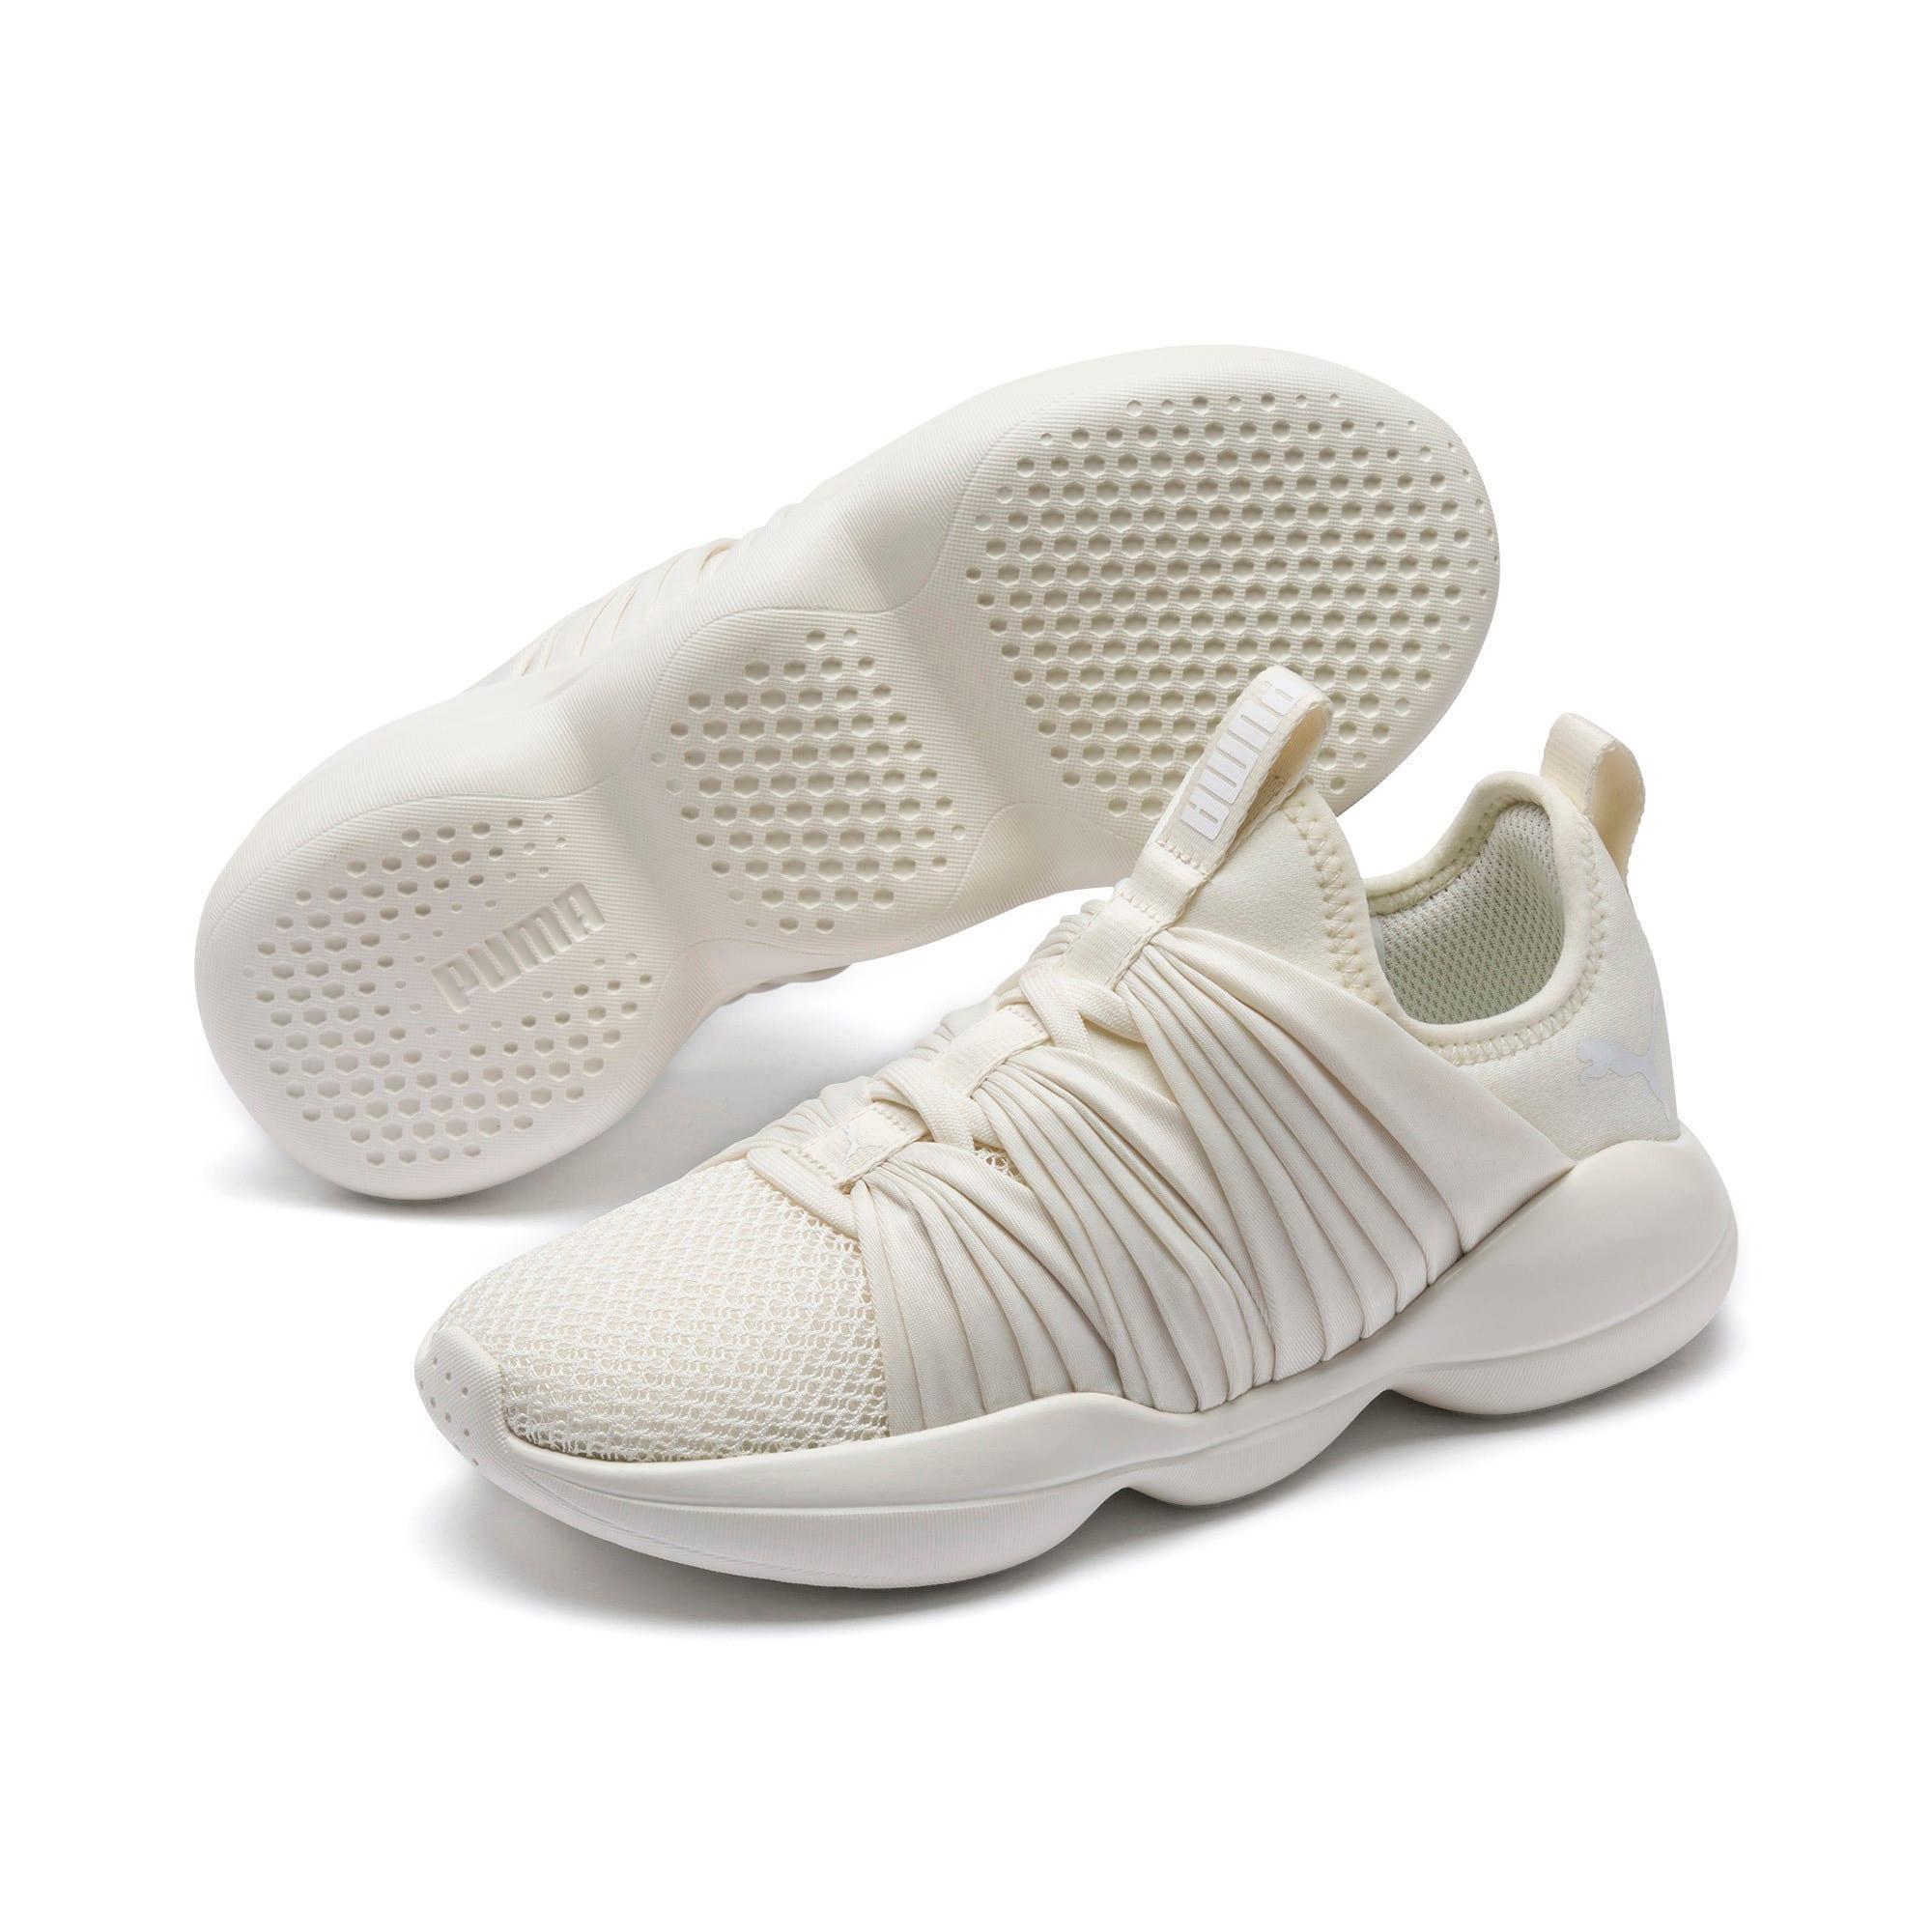 Thumbnail 2 of Flourish Women's Training Shoes, Whisper White-Puma White, medium